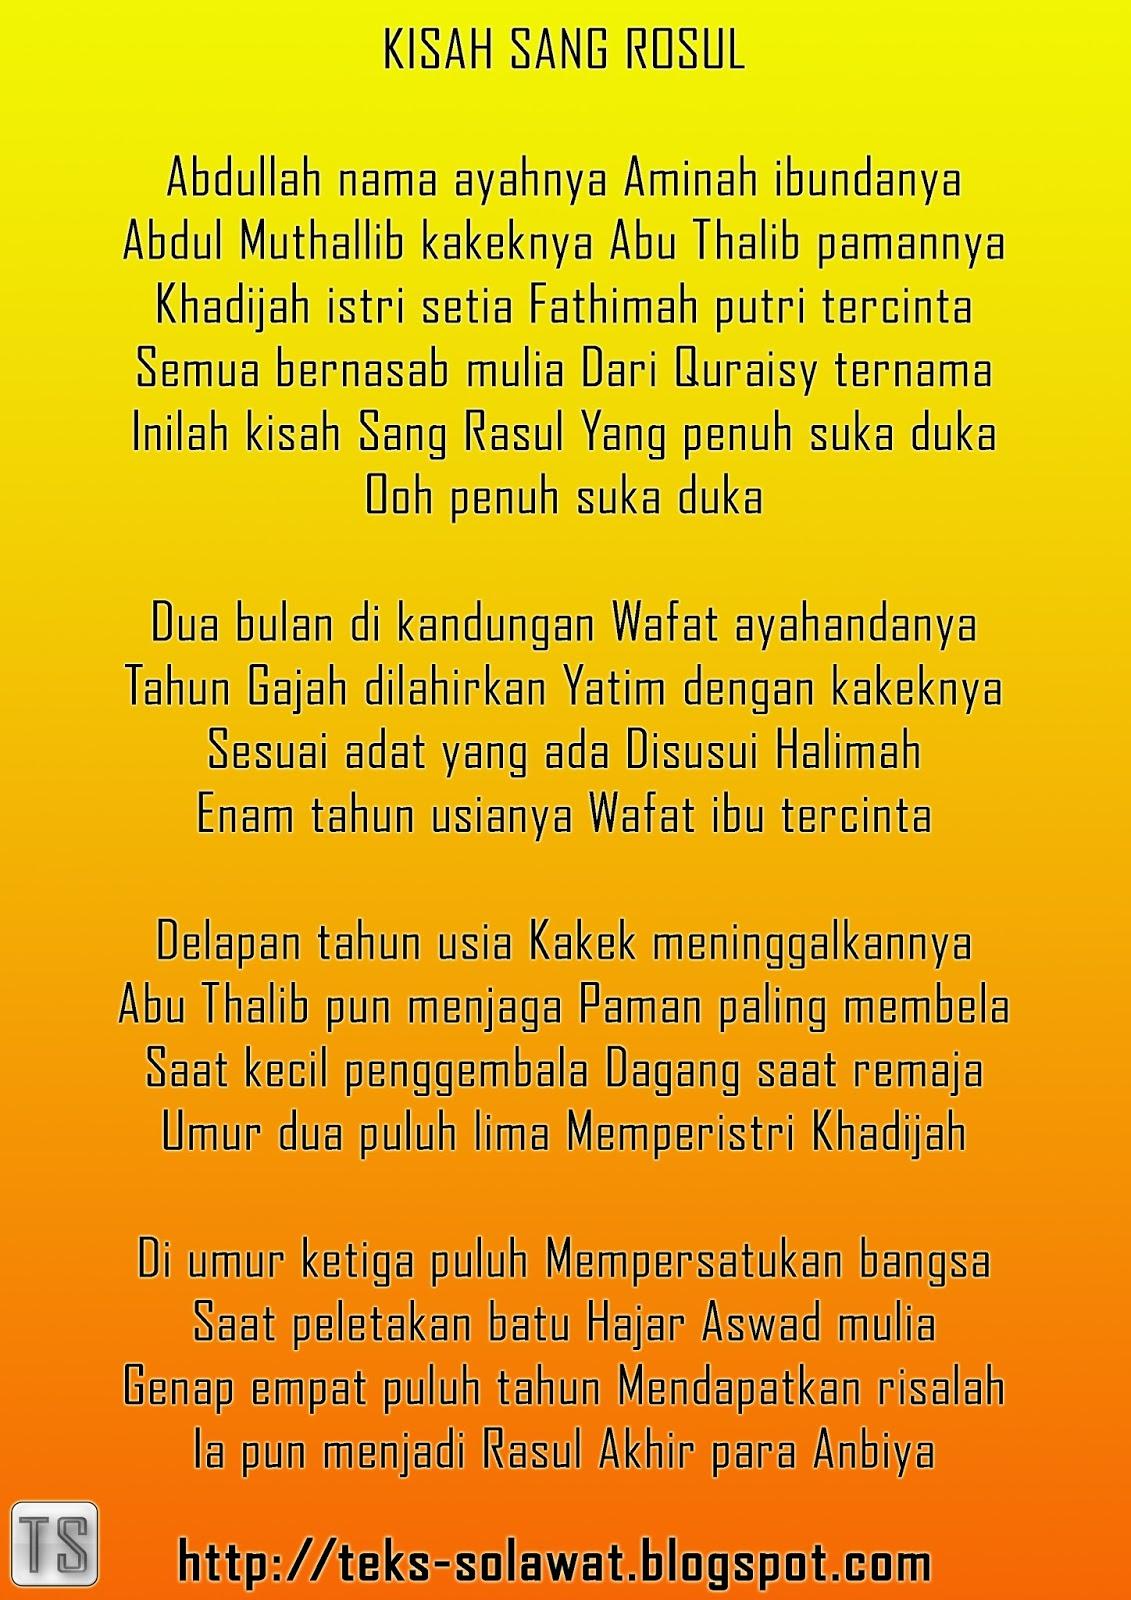 Lagu kisah sang rasul hd mp4 videos download.